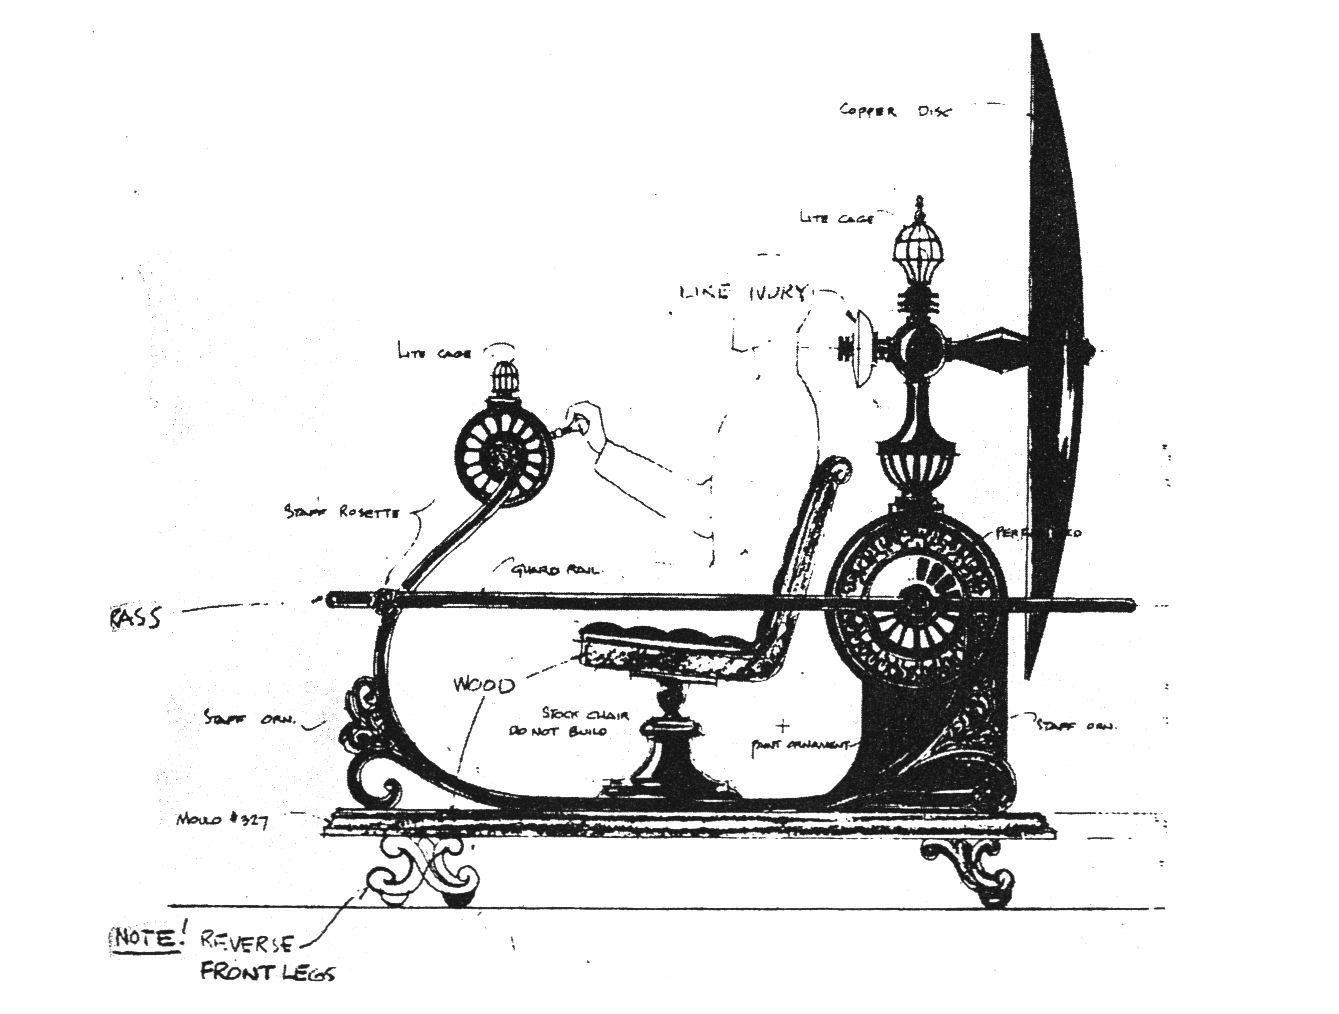 Time Travel Machine Prop